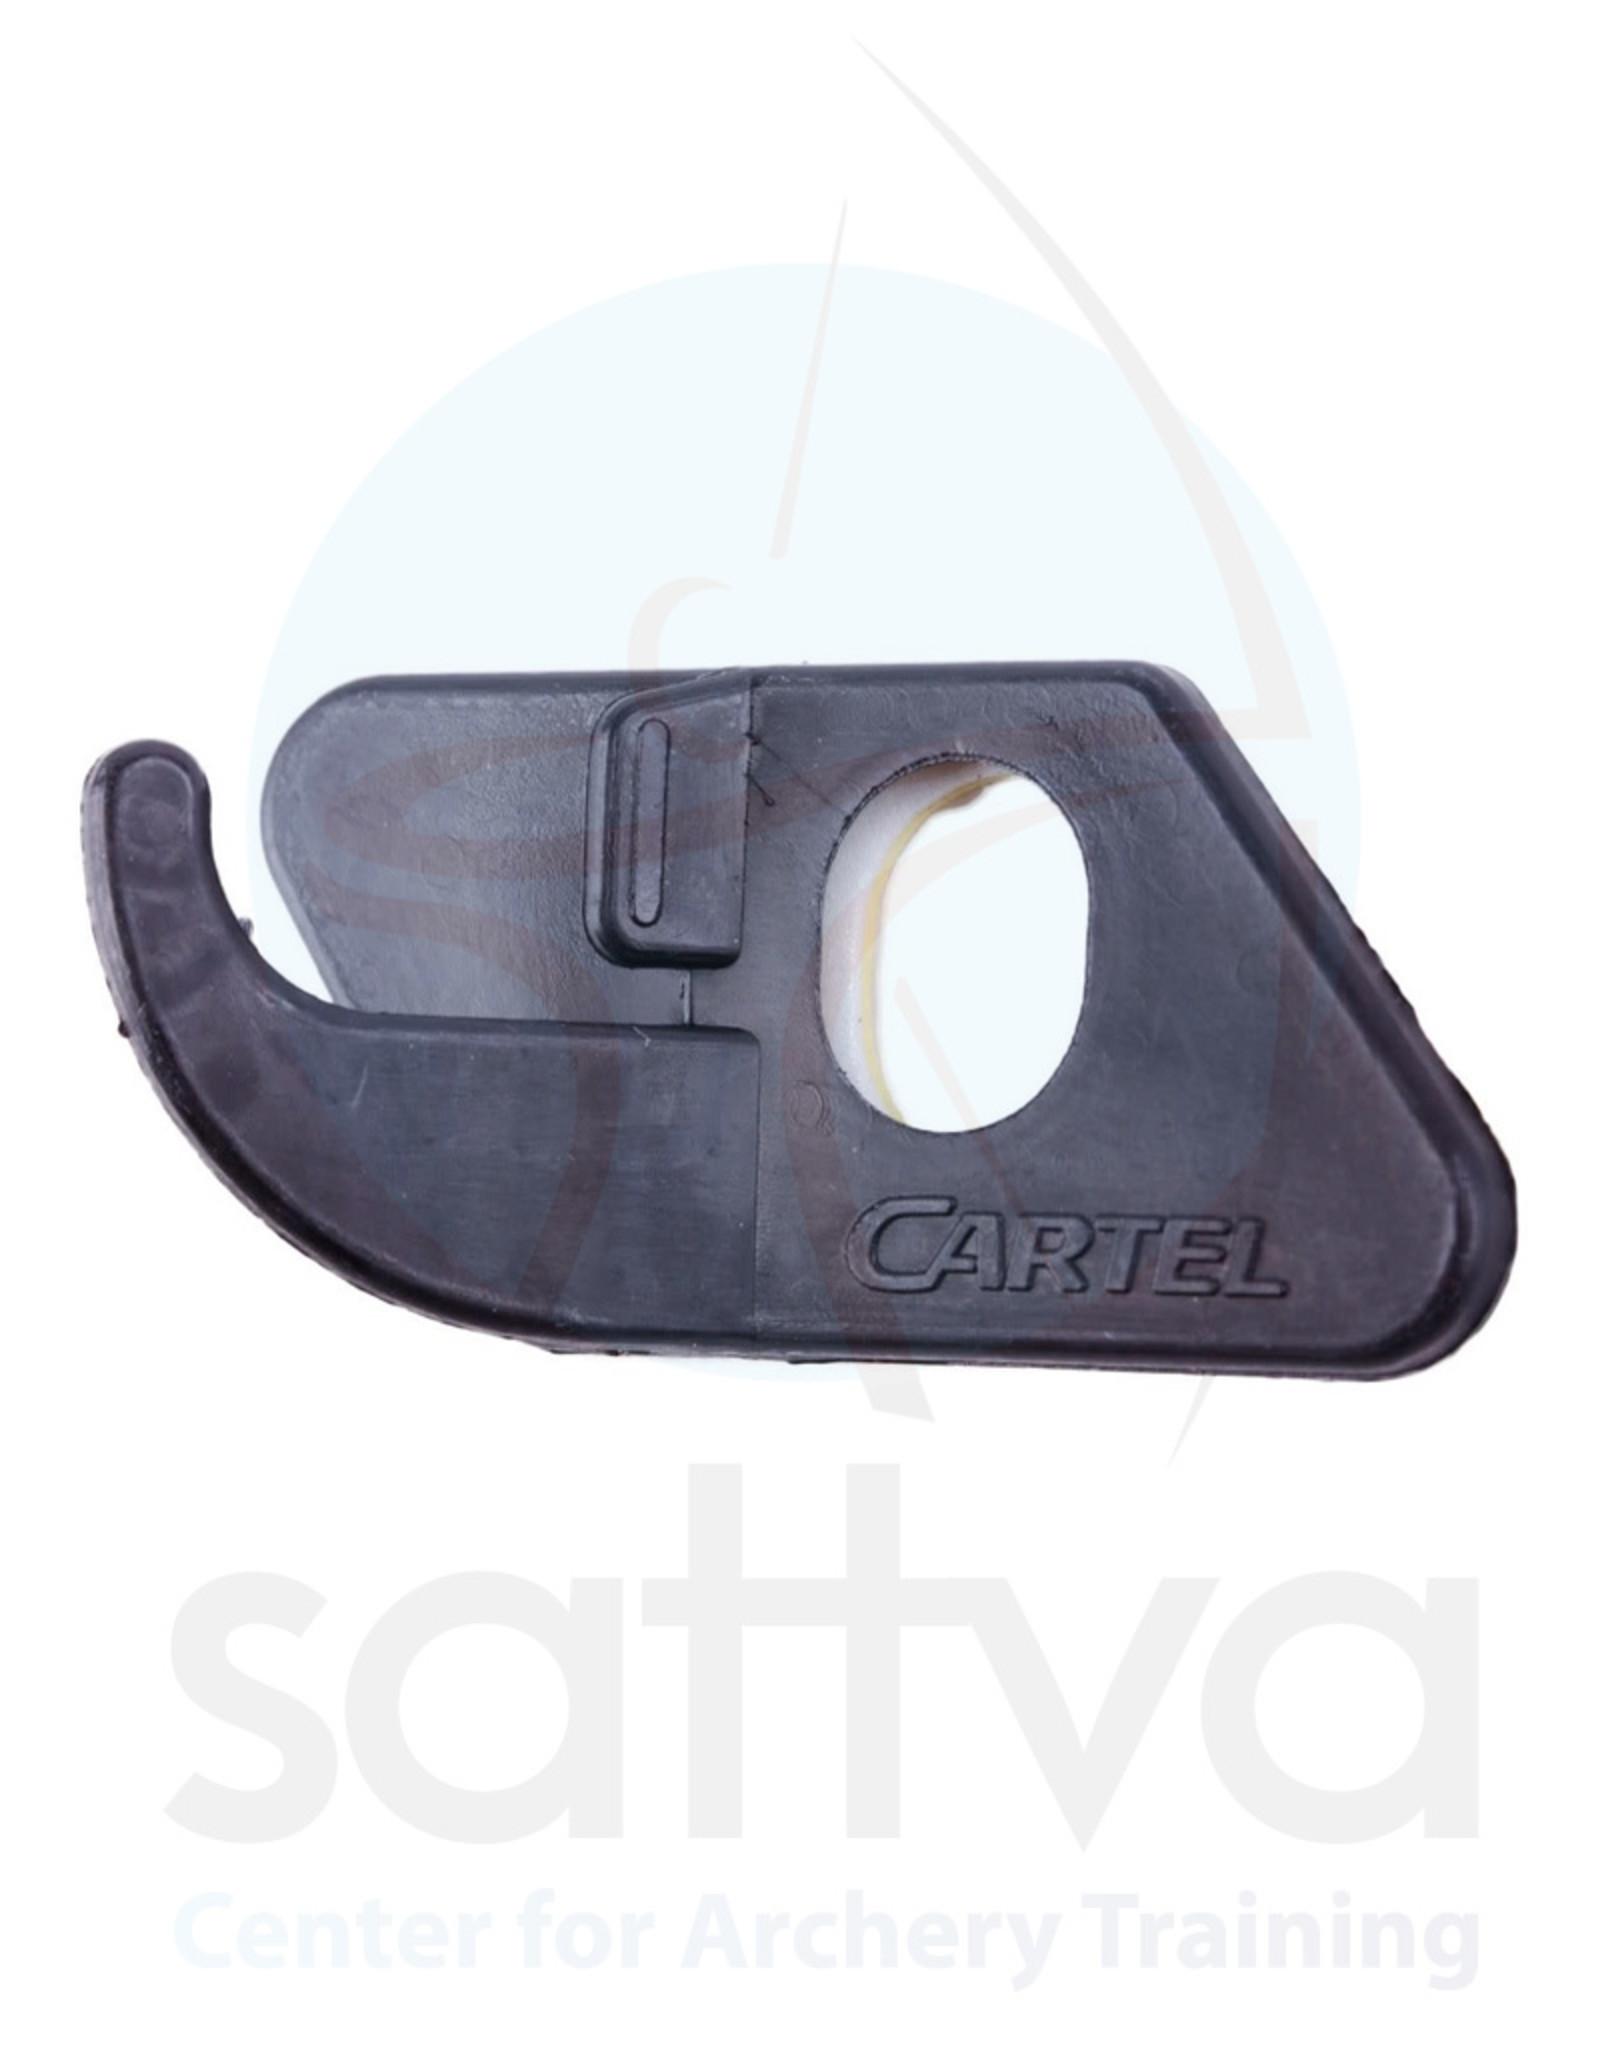 Cartel Cartel Black Arrow Rest